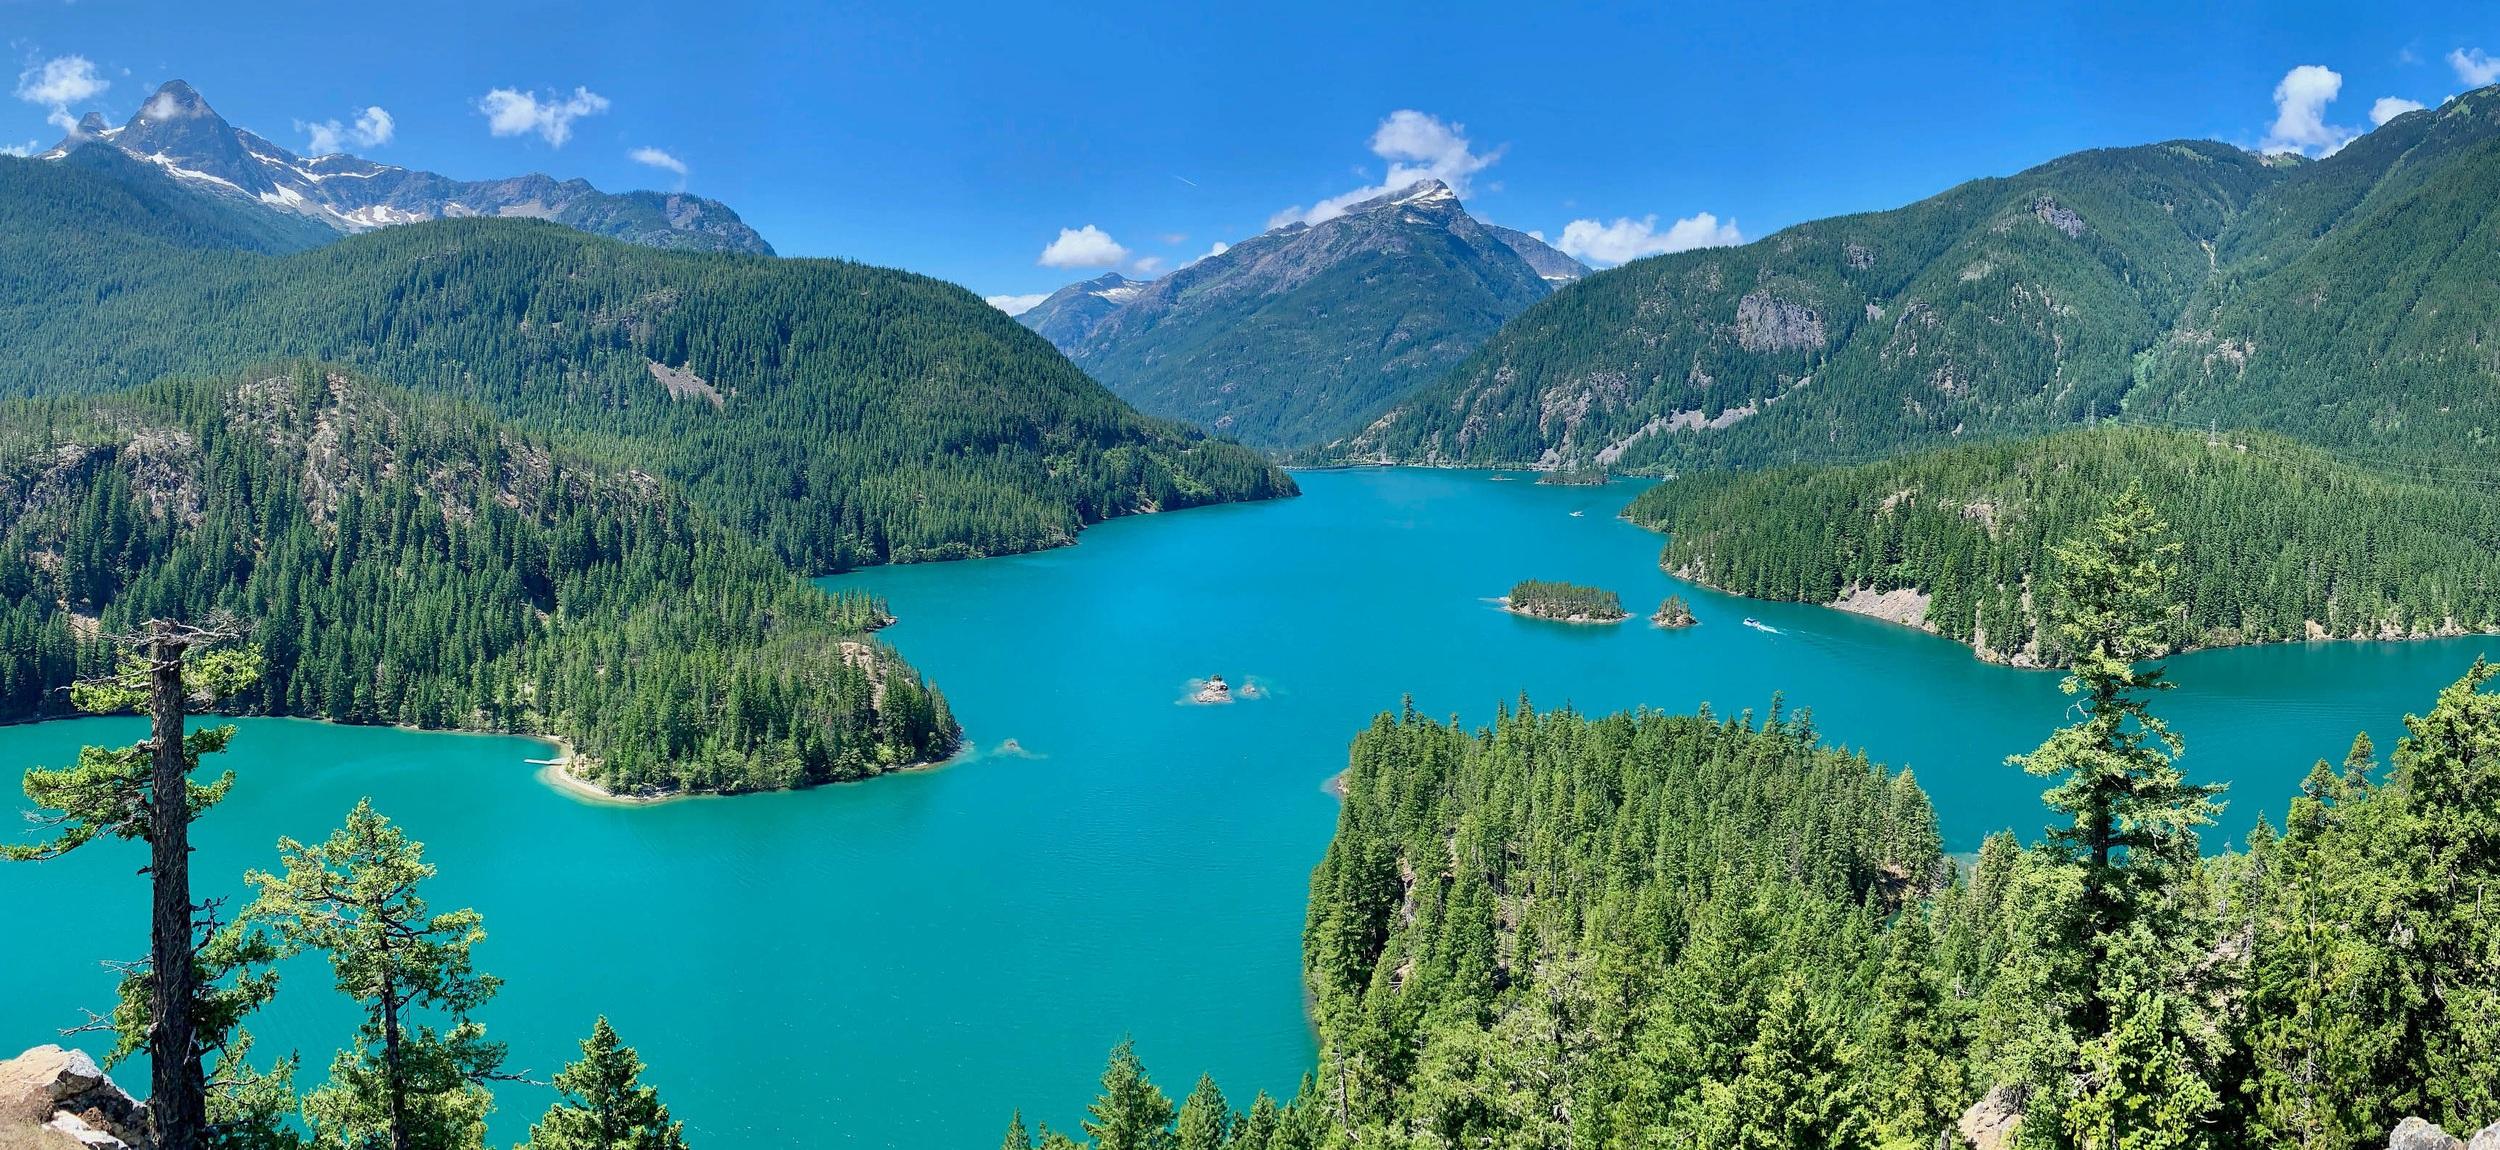 Steph Pyles, Ross Lake, North Cascades, WA